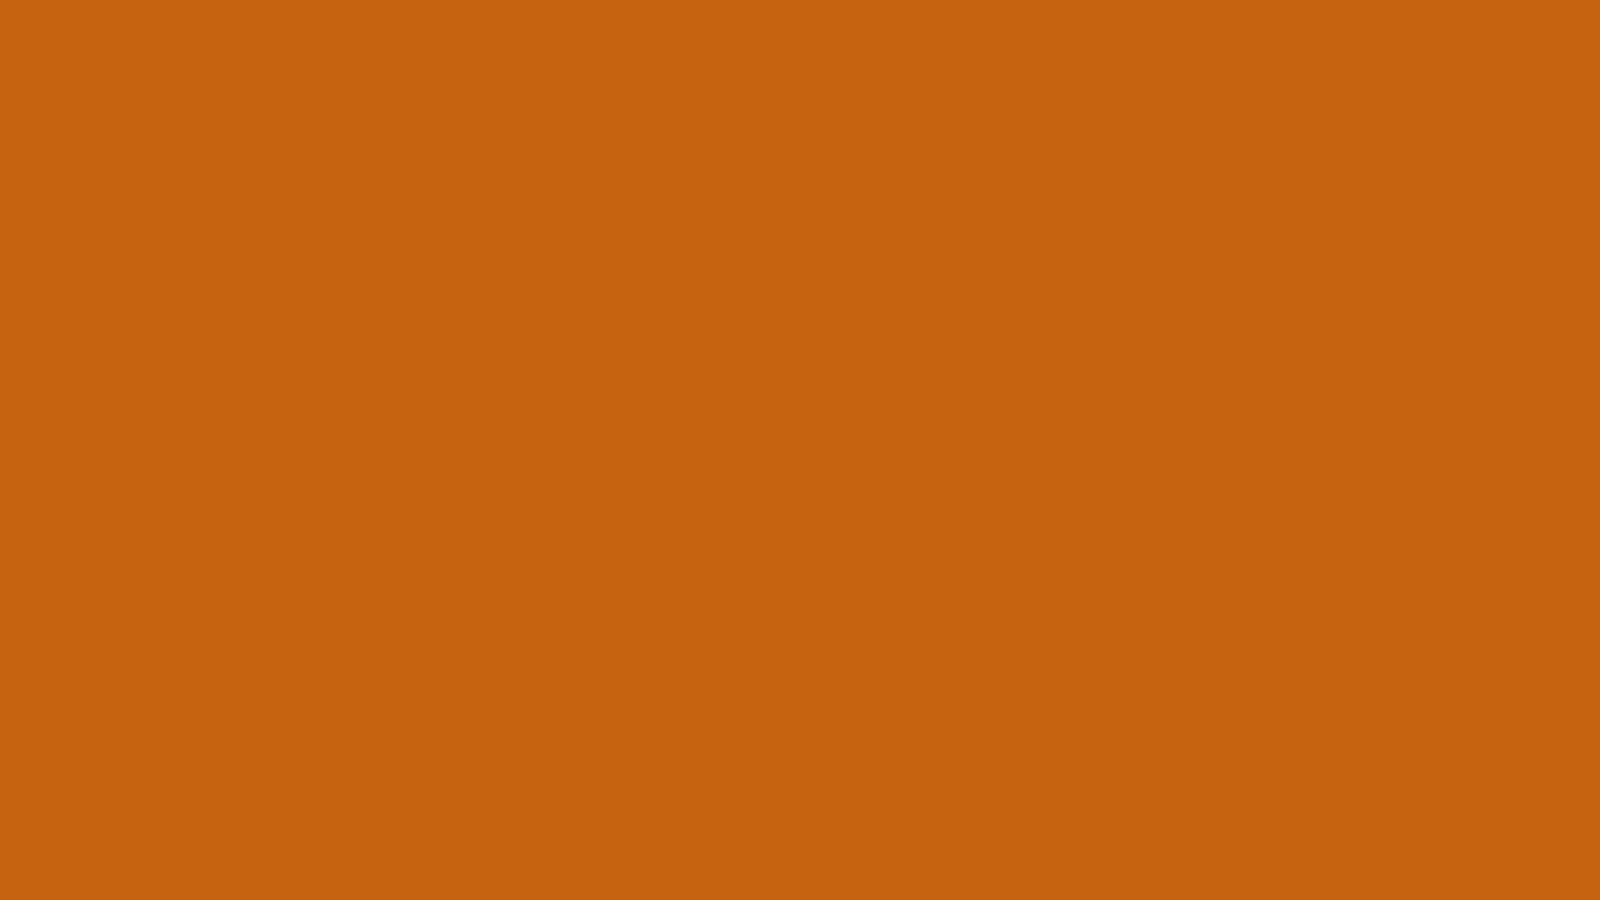 1600x900 Alloy Orange Solid Color Background